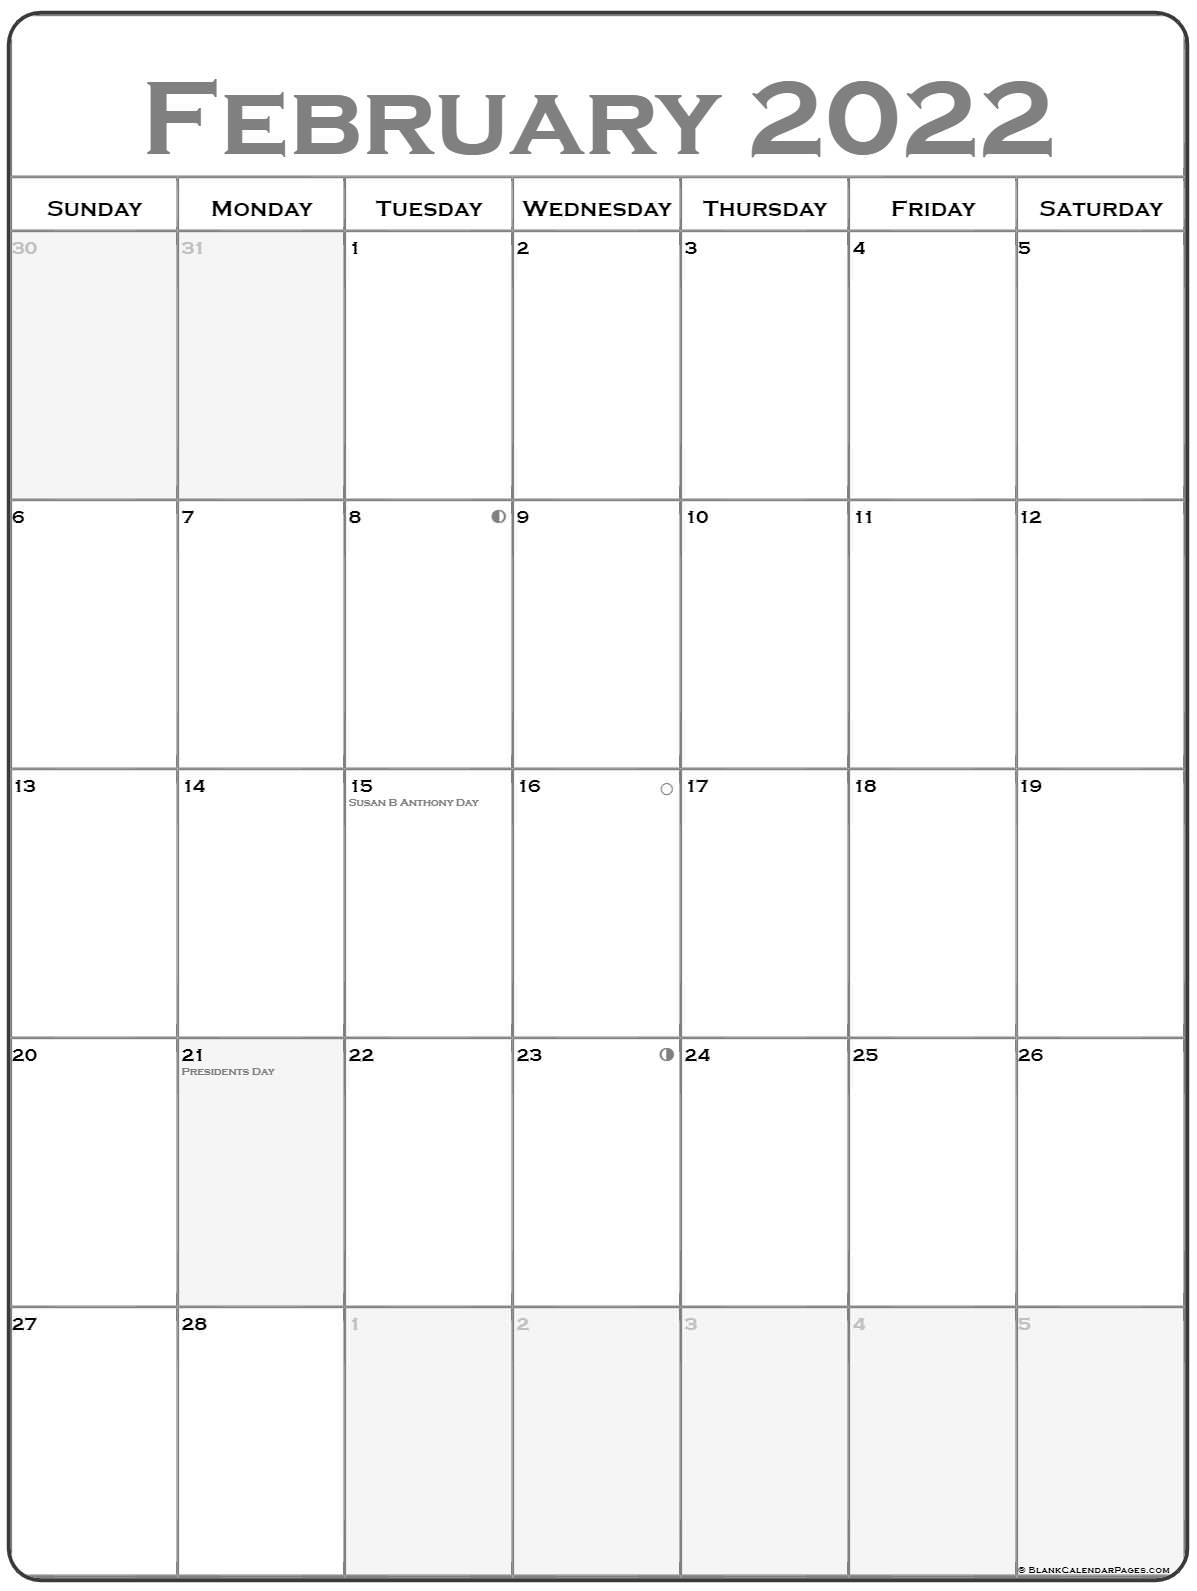 February 2022 Vertical Calendar | Portrait Throughout Blank Calendar For February 2022